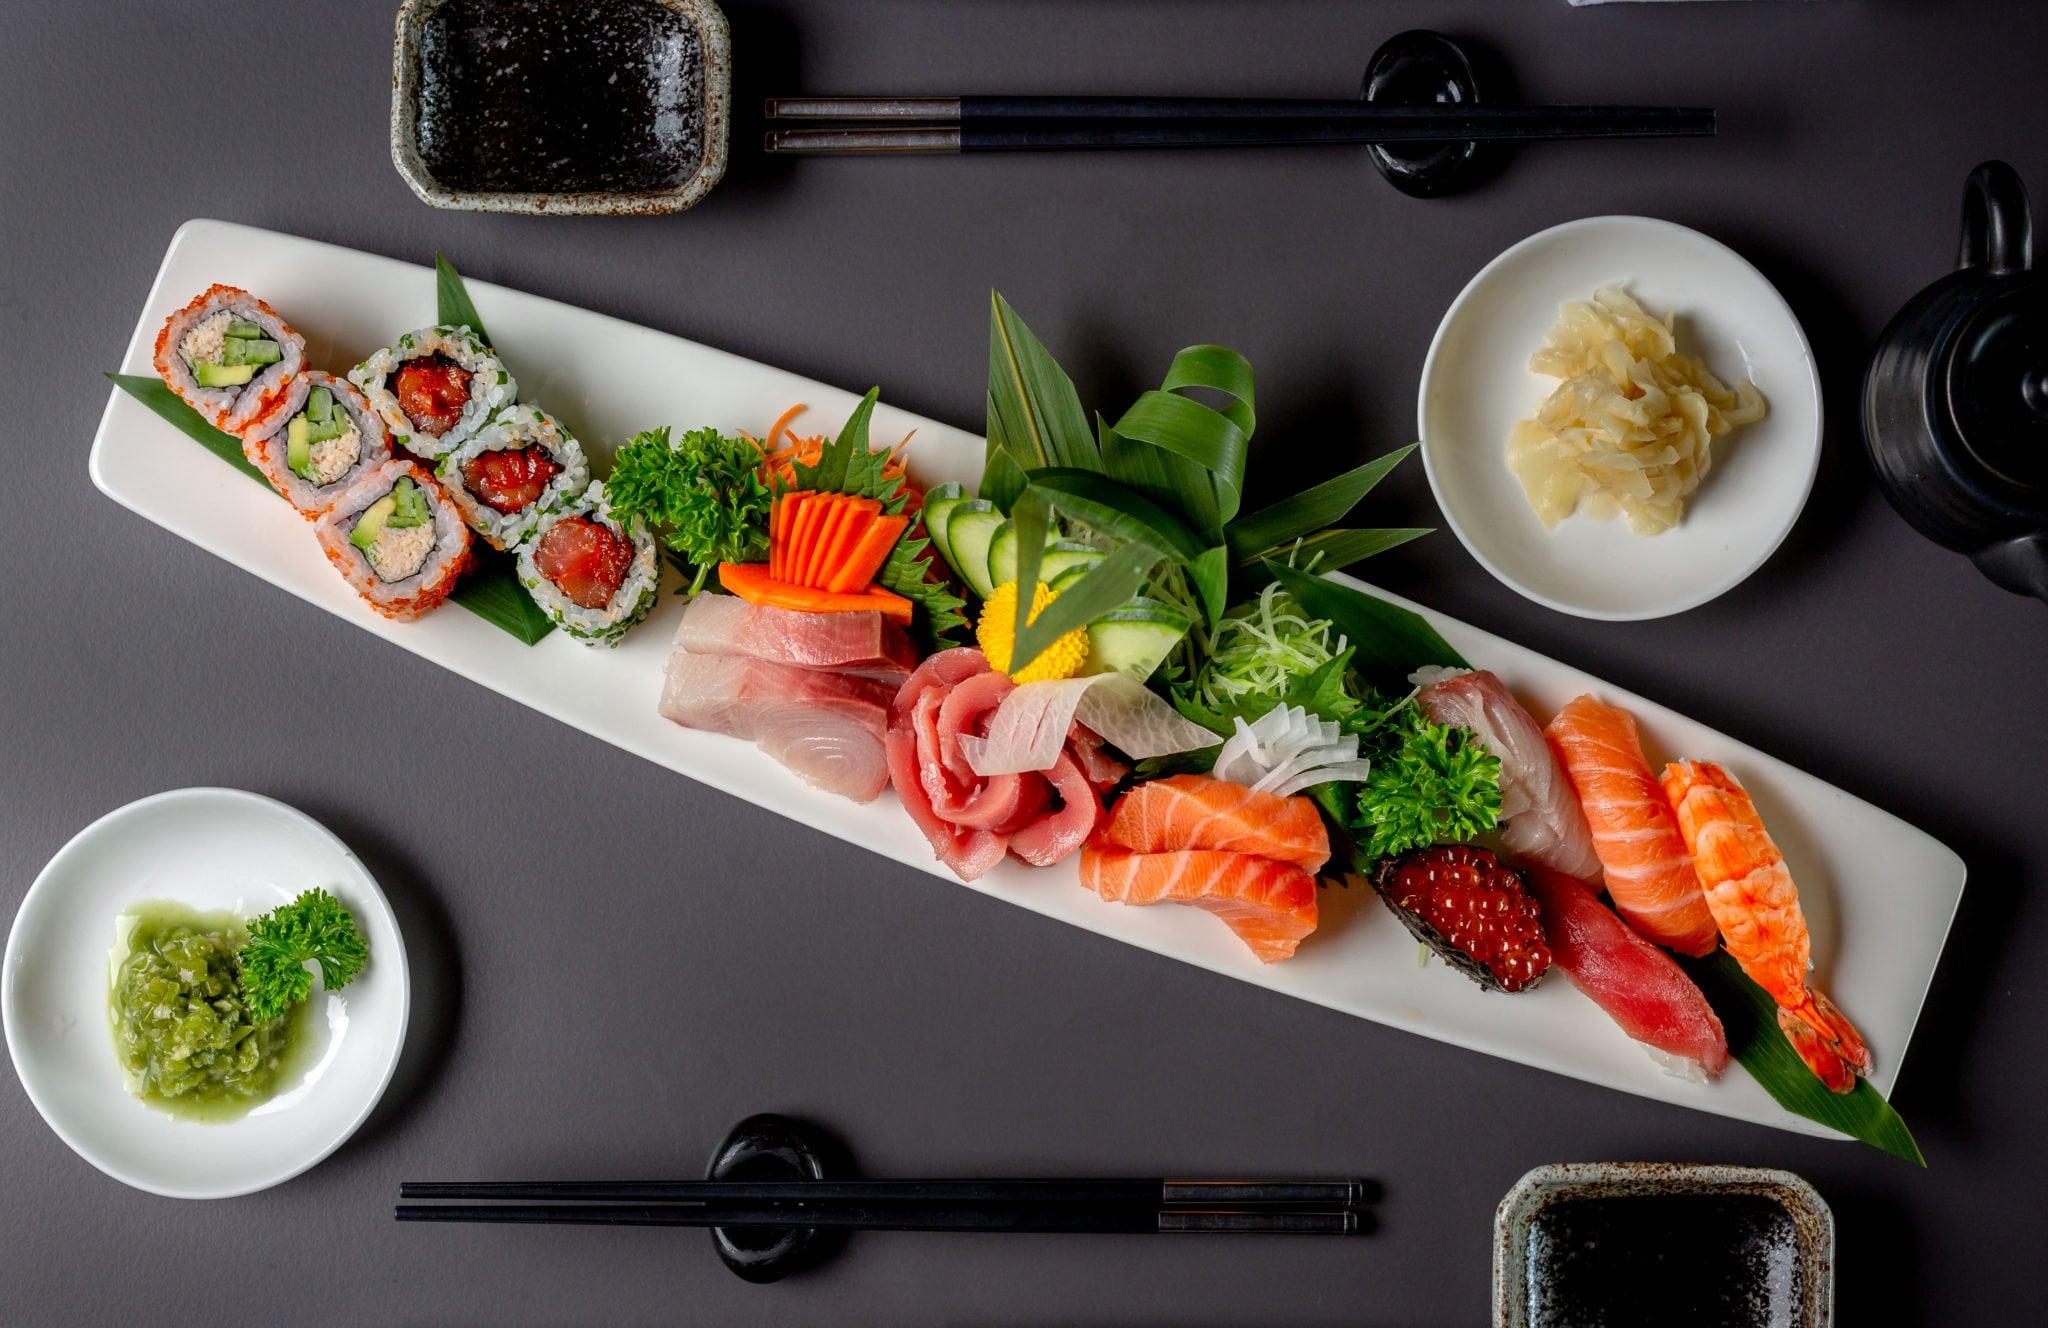 Foodetective · Ichi Sushi & Sashimi Restaurant, London